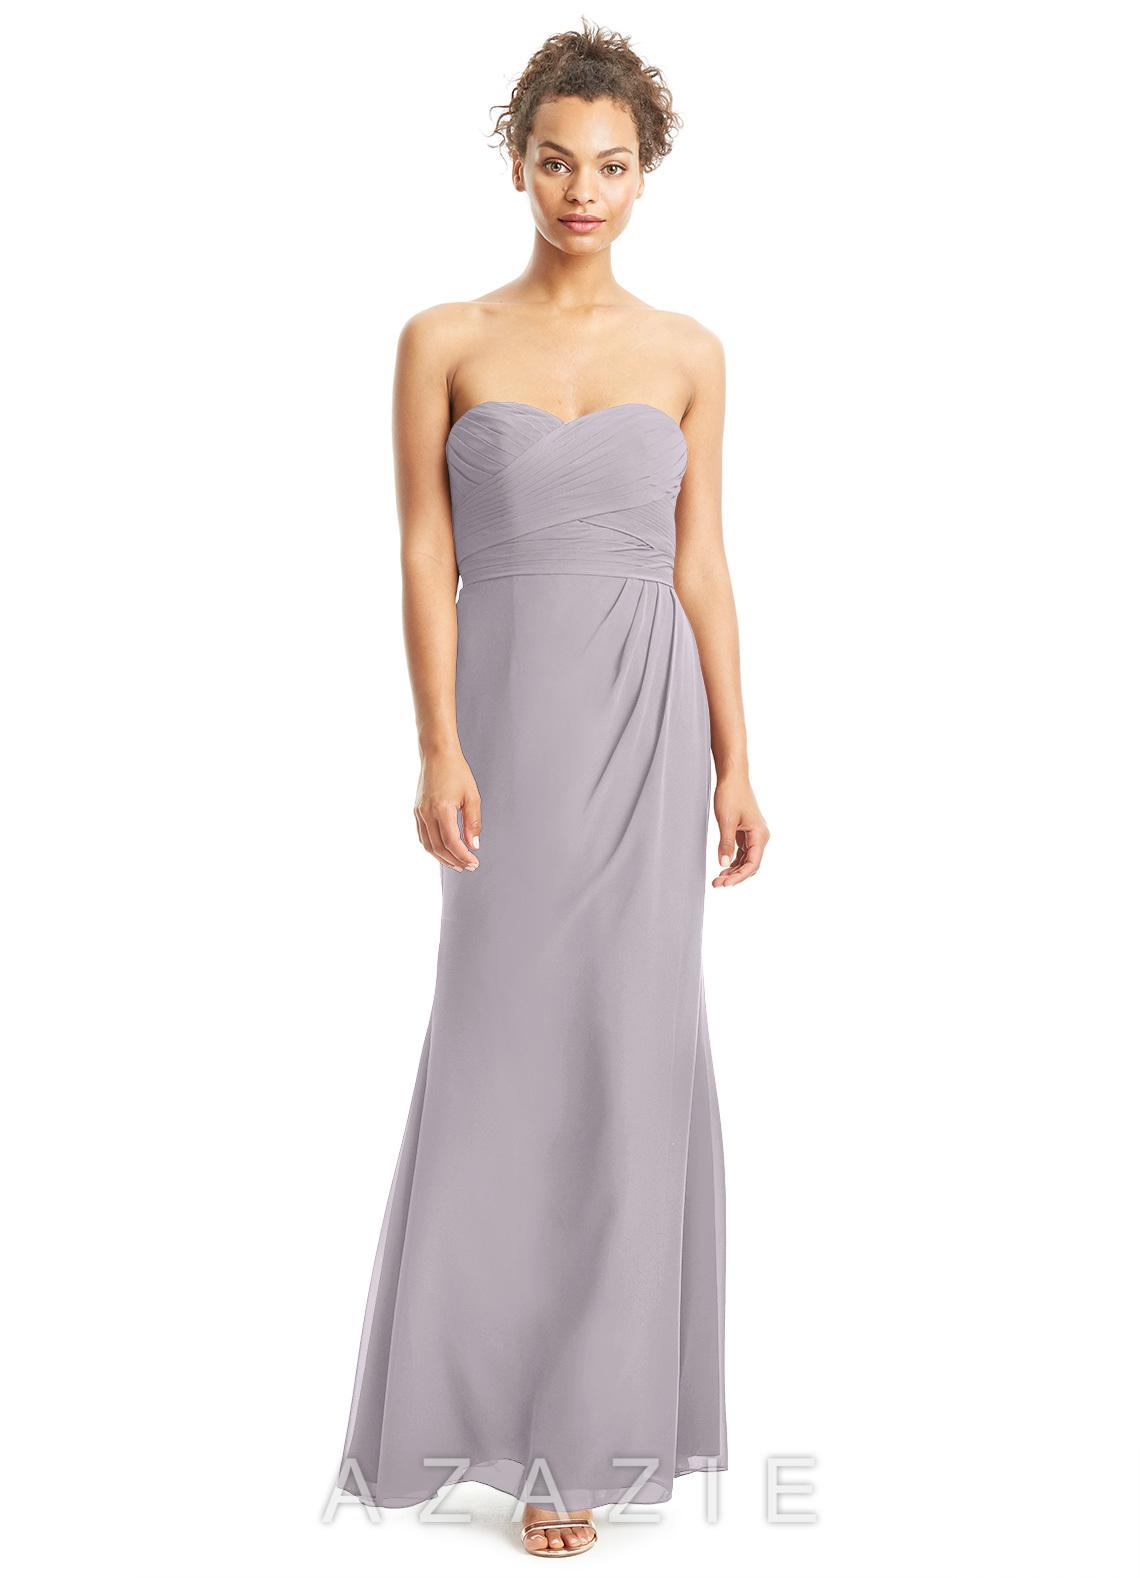 Azazie ivy bridesmaid dress azazie loading zoom ombrellifo Image collections